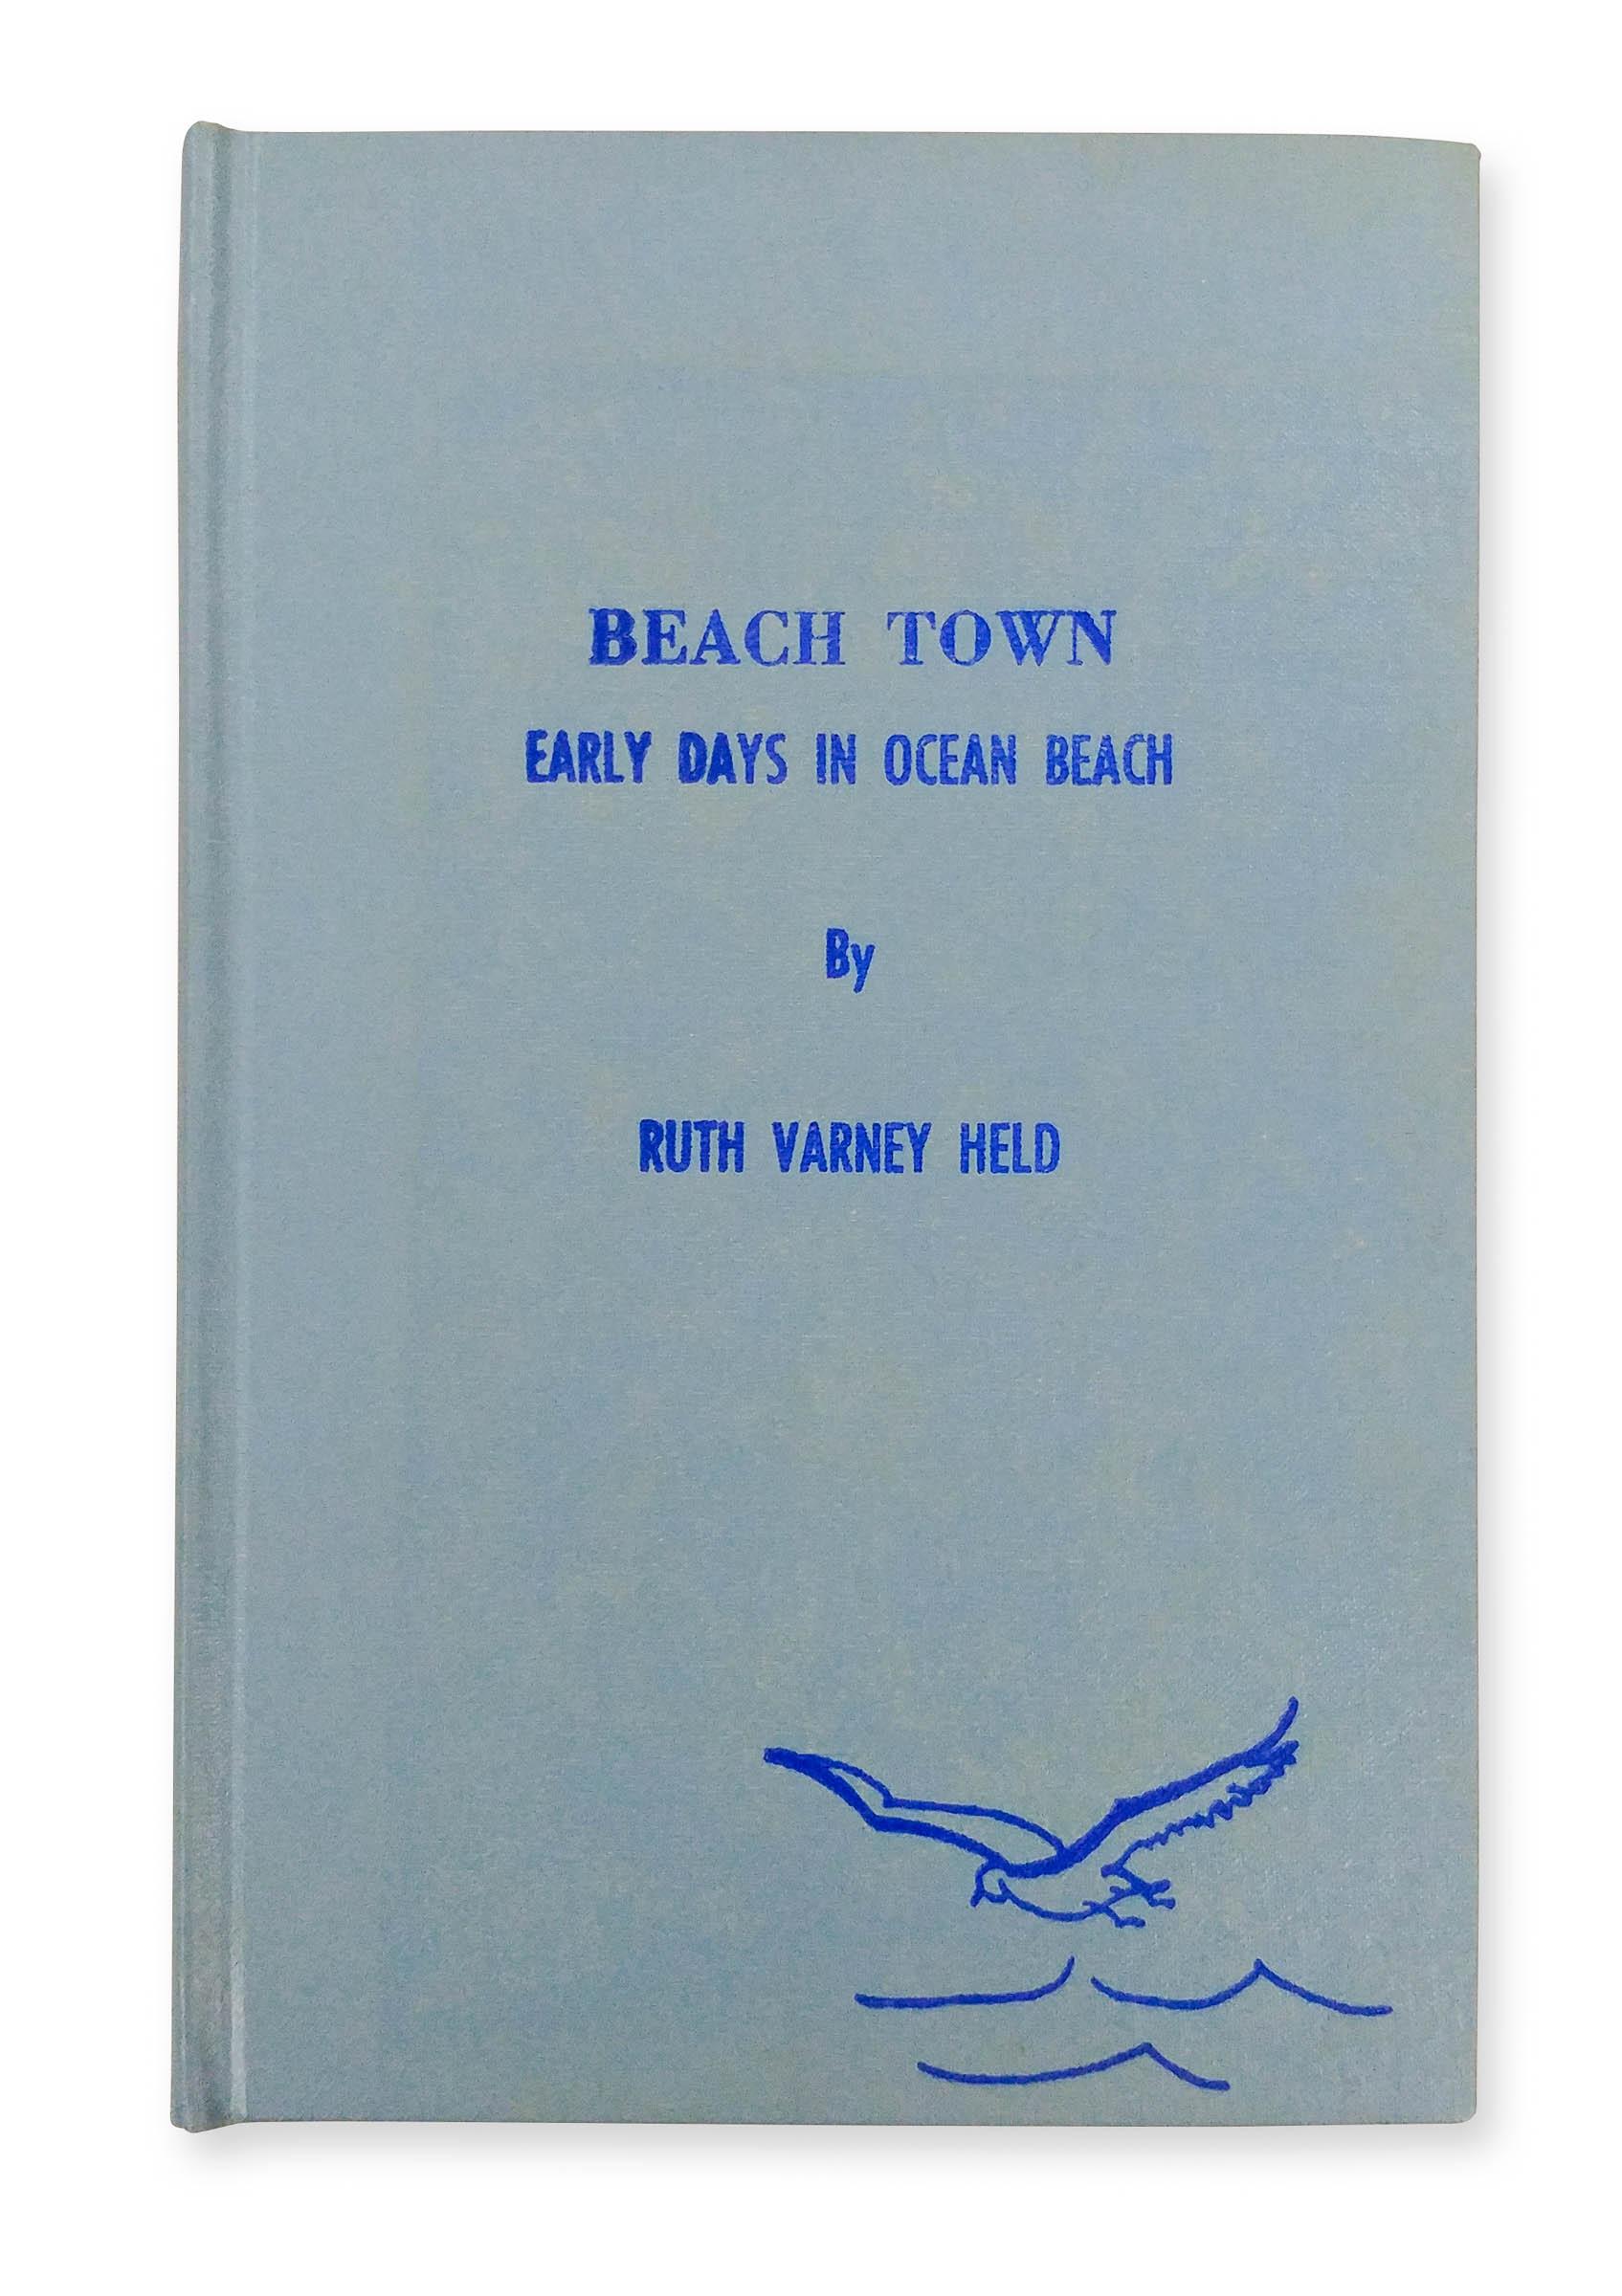 Ocean Beach Product: Beach Town by Ruth Varney Held (light blue edition)